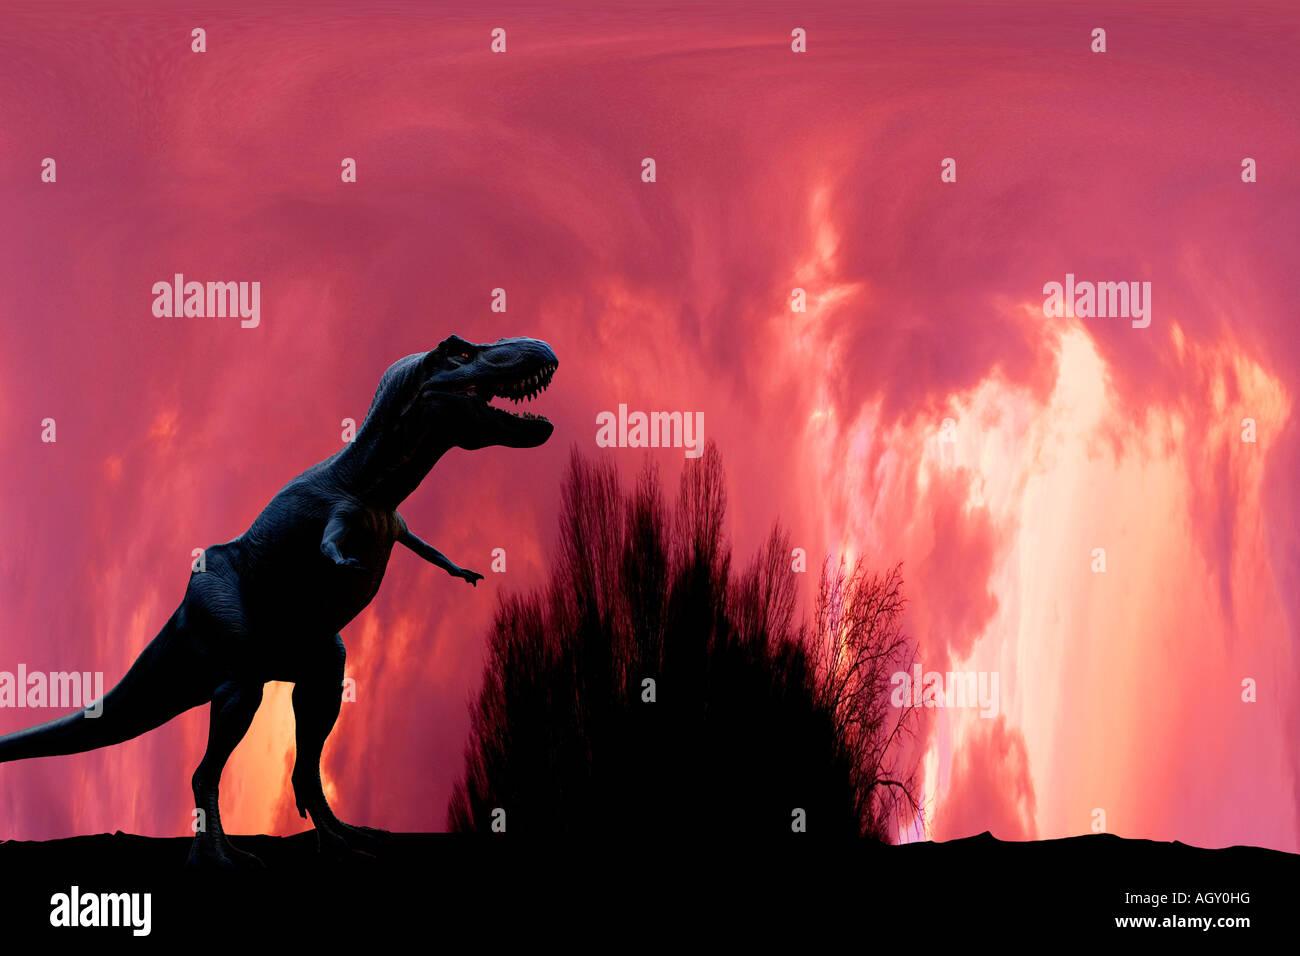 T-rex dinosaur - Stock Image